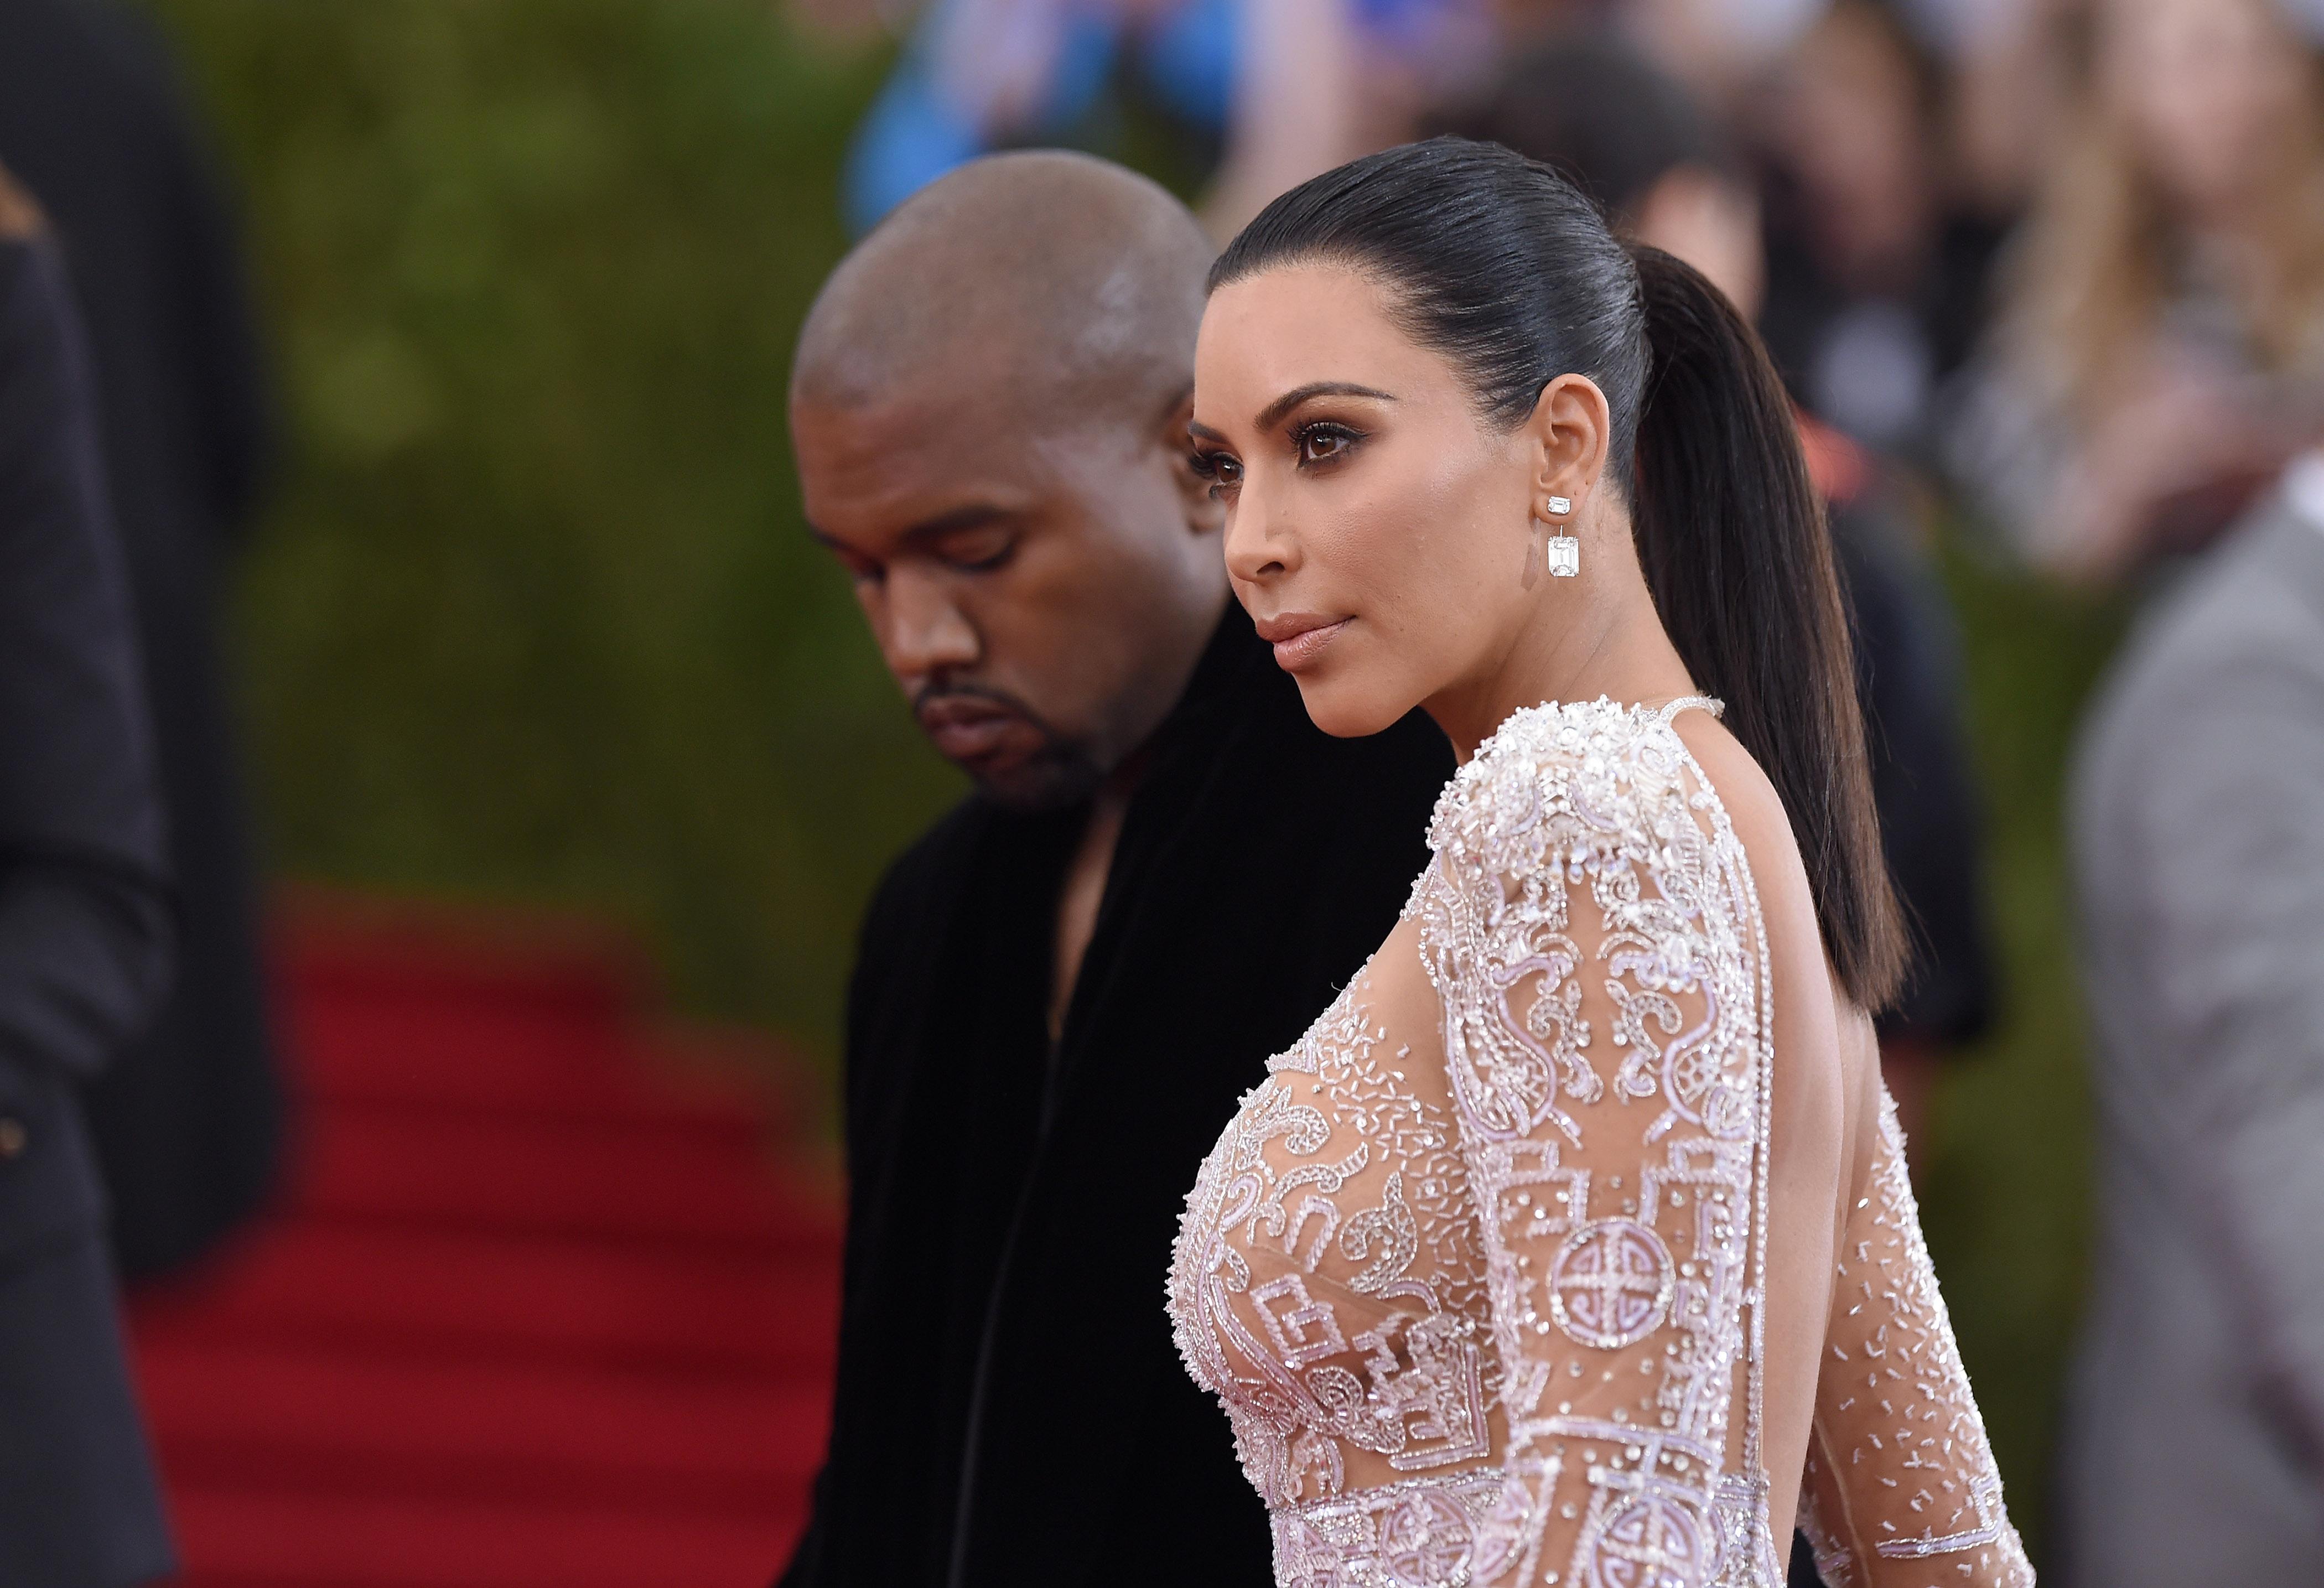 Kim and Kanye at last year's Met Gala.